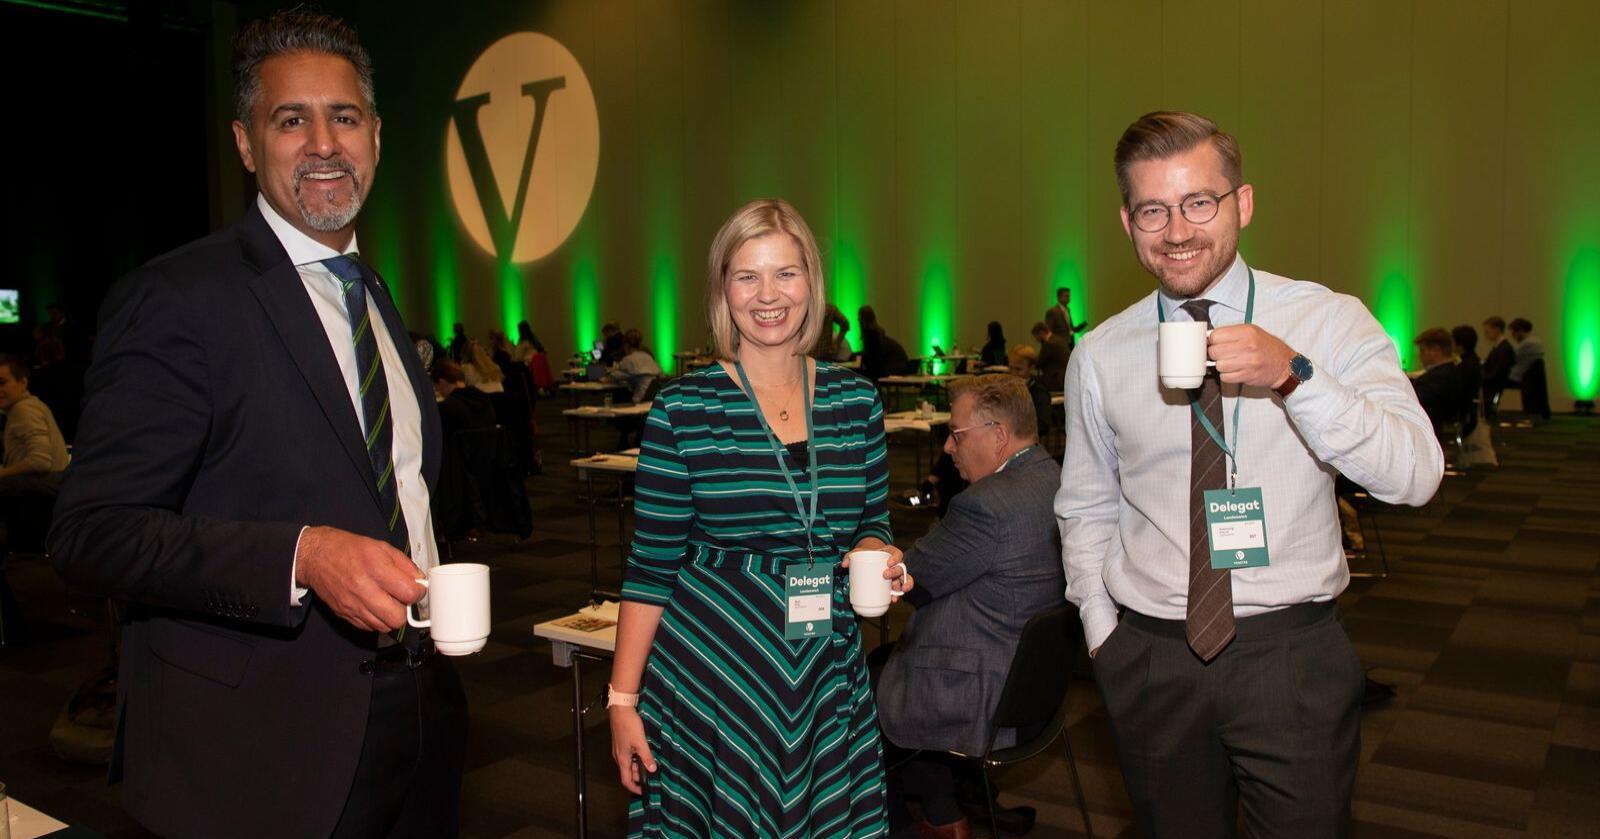 Påtroppende ledertrio: Abid Raja, Guri Melby og Sveinung Rotevatn var tydelig i godt humør fra start under landsmøtet til Venstre i helga.Foto: Geir Olsen / NTB